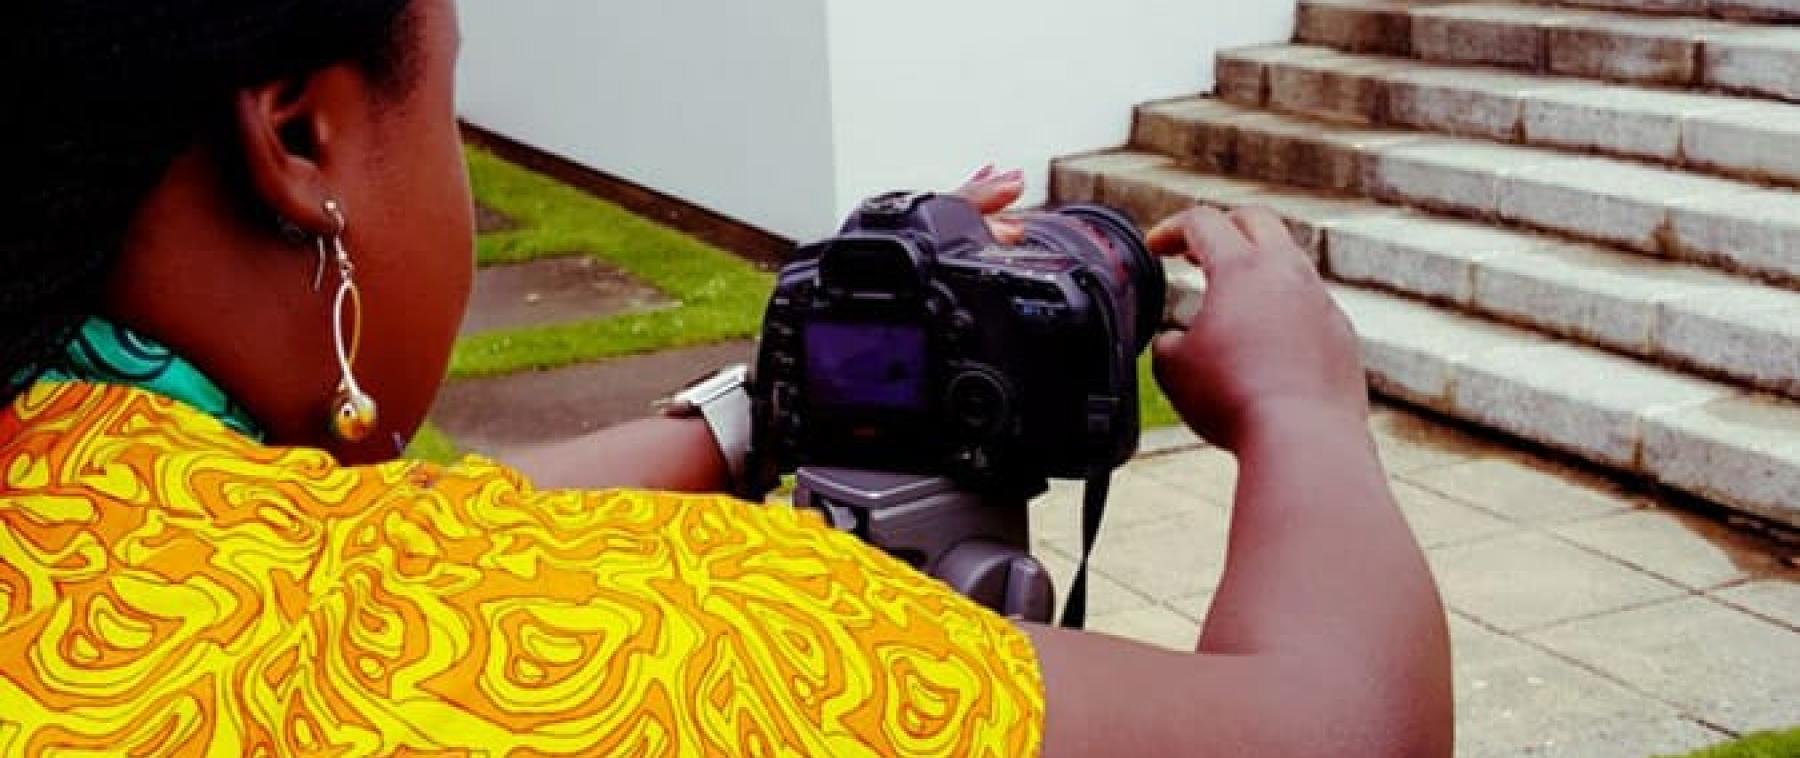 PONToon beneficiary practices her camera skills